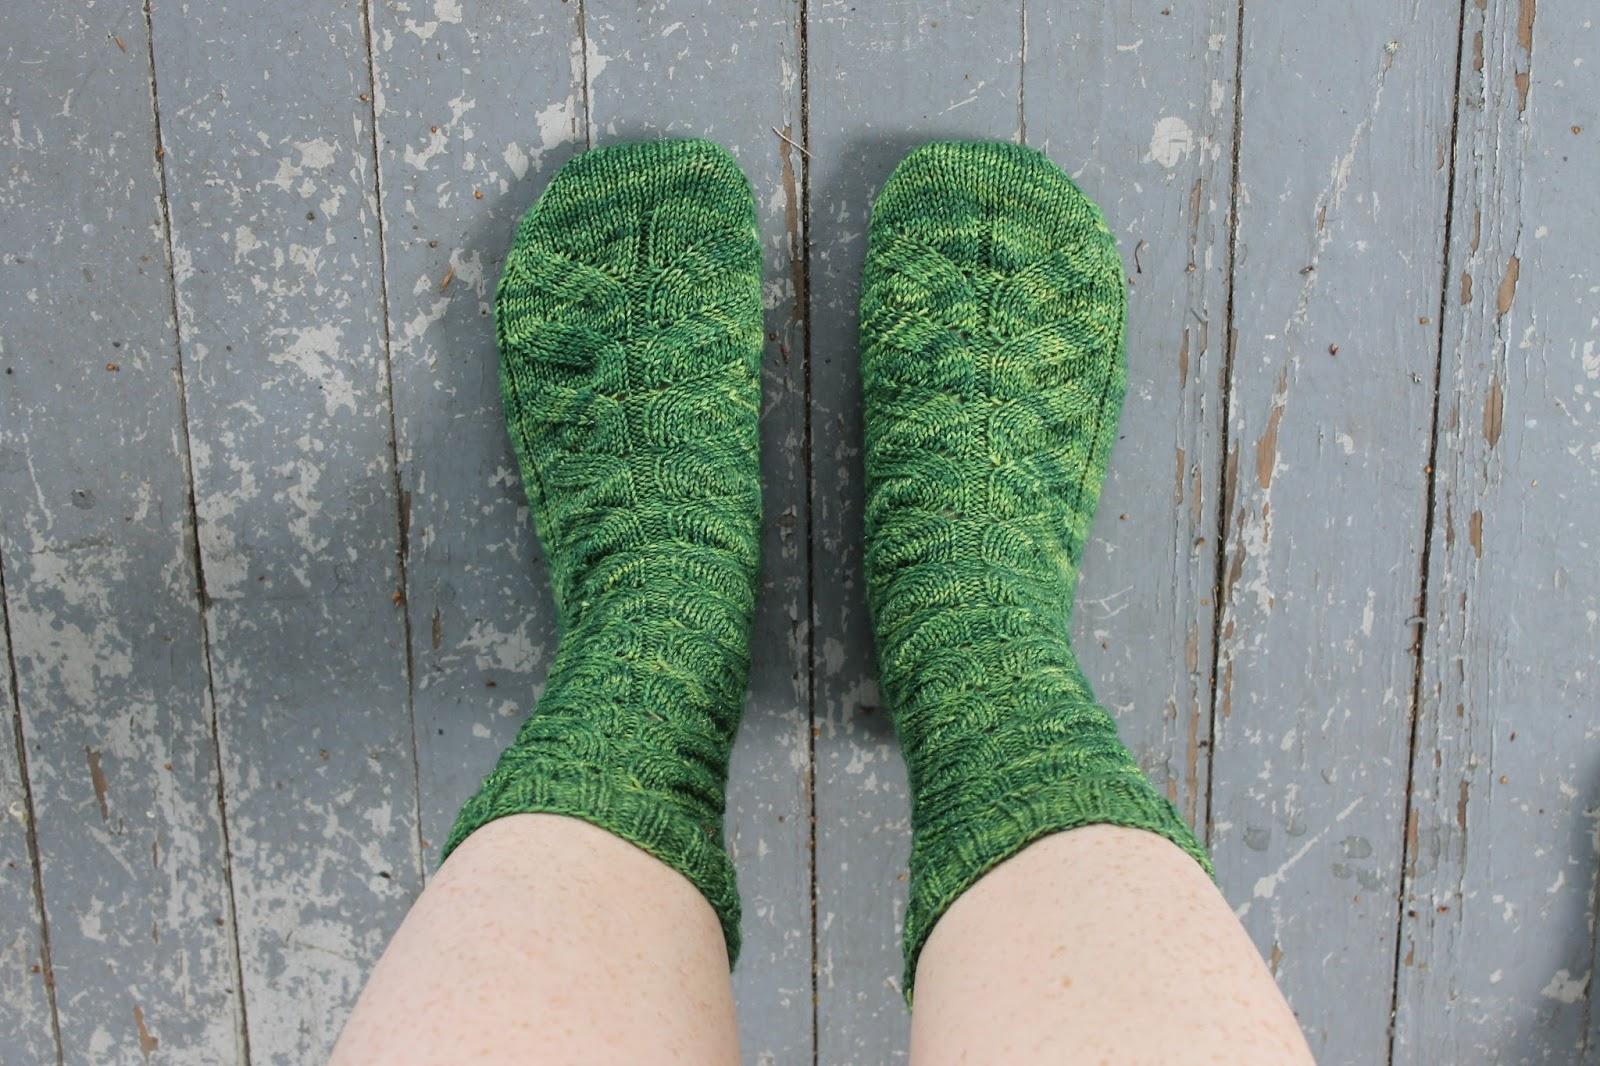 The Feisty Redhead: Tadpole Knit Socks for Mom